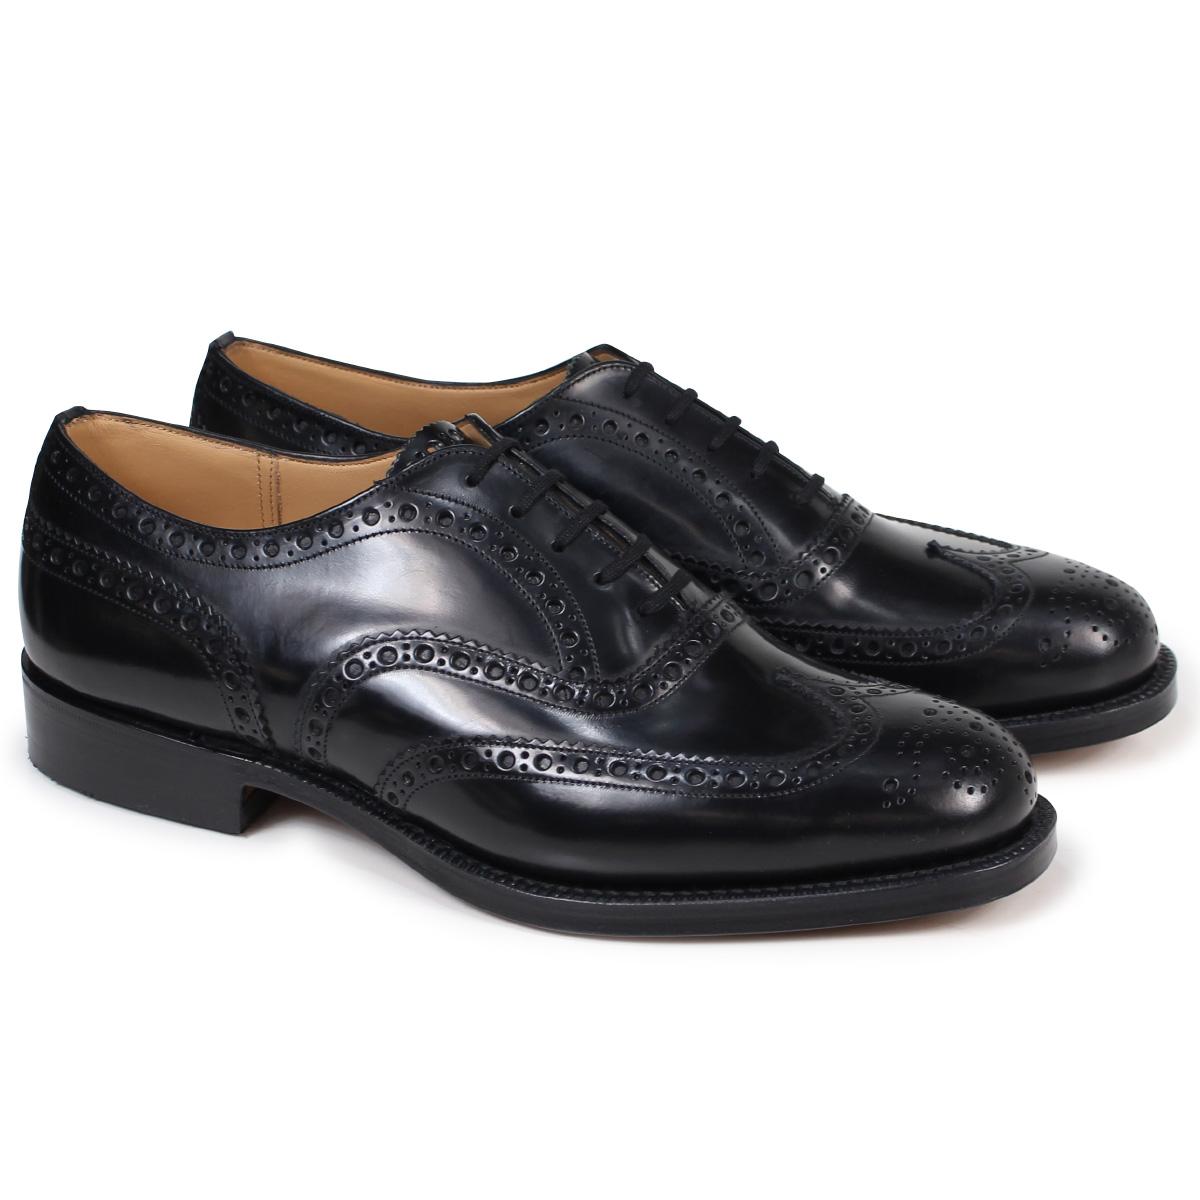 Burwood shoes - Black Churchs abgA5AMS